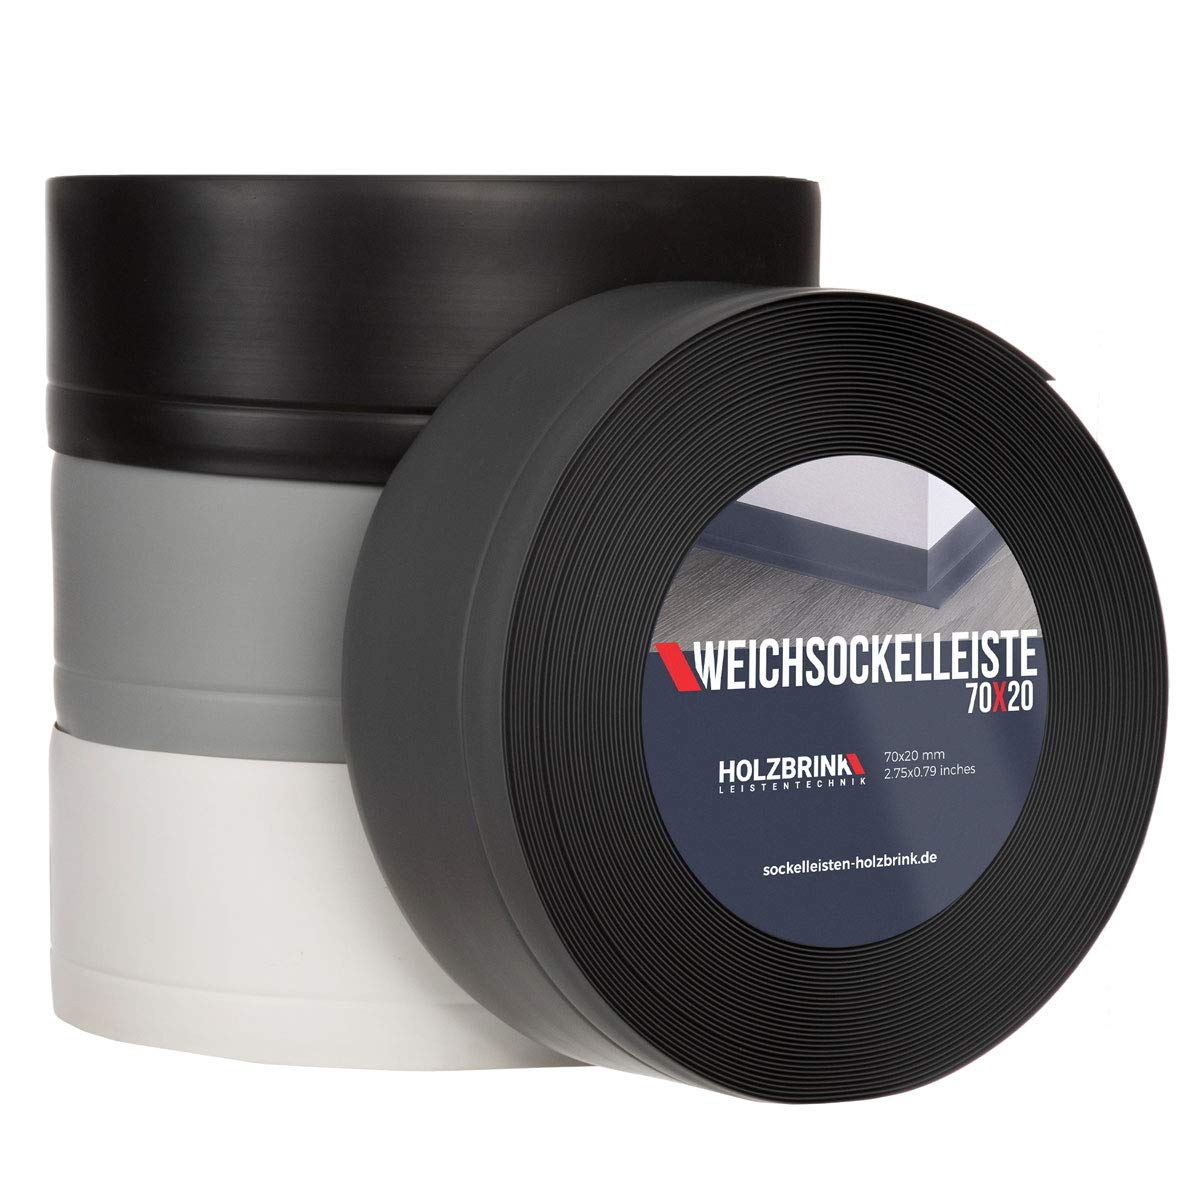 70x20mm HOLZBRINK Weichsockelleiste selbstklebend Graphitgrau Knickleiste Material: PVC 5 Meter